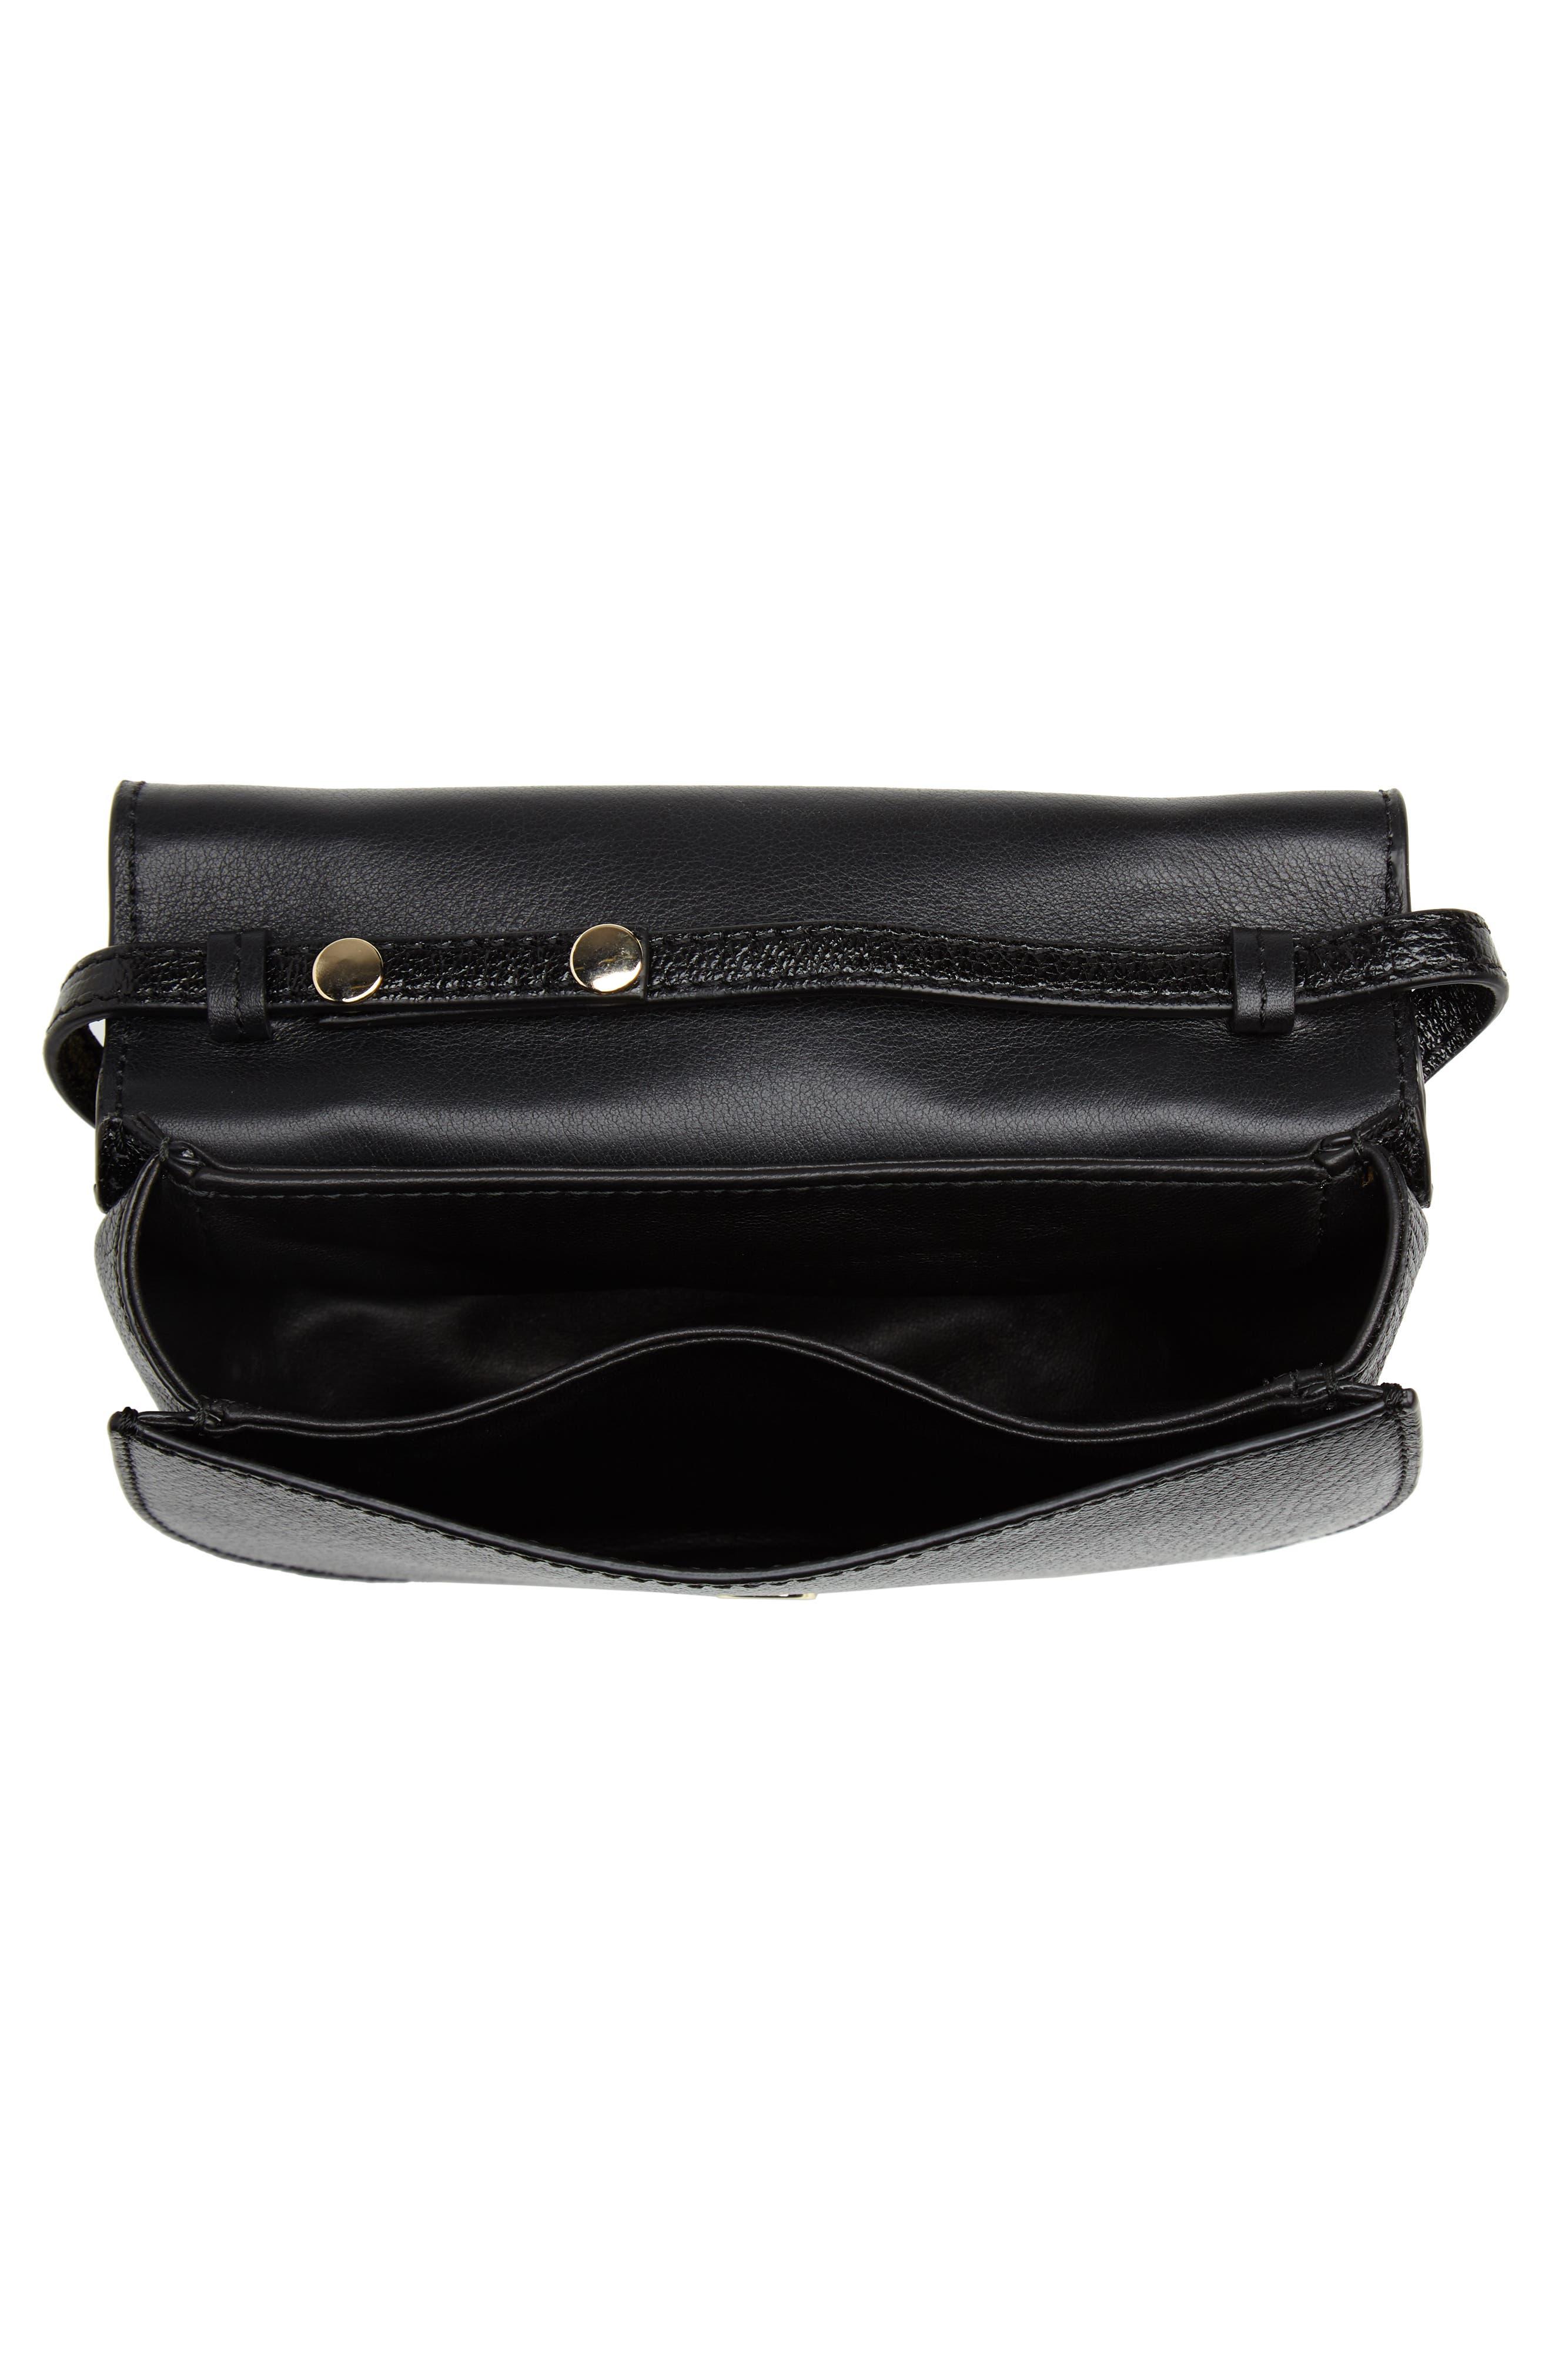 Half Moon Lux Calfskin Leather Crossbody Bag,                             Alternate thumbnail 4, color,                             001